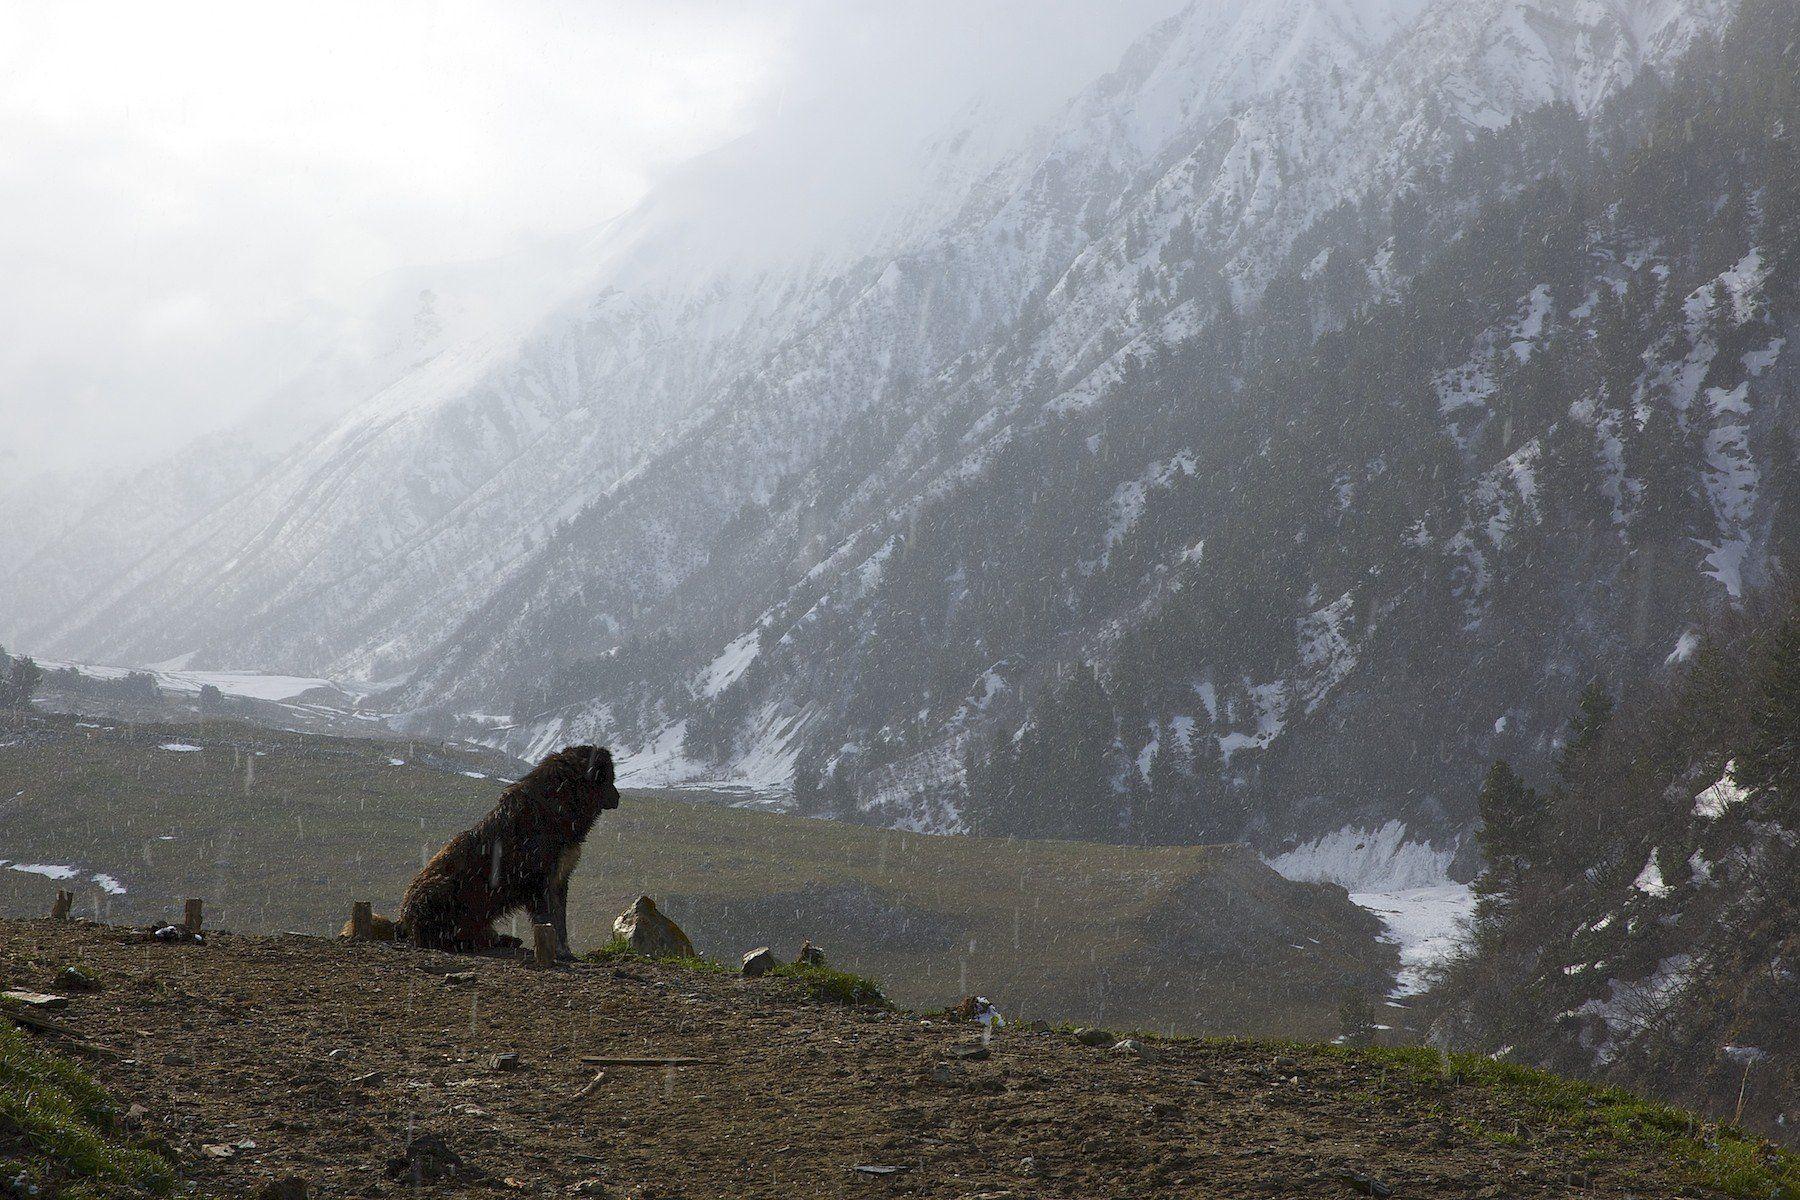 адиши-село, грузия, май, пейзаж, природа, сванети, Мазурин Евгений